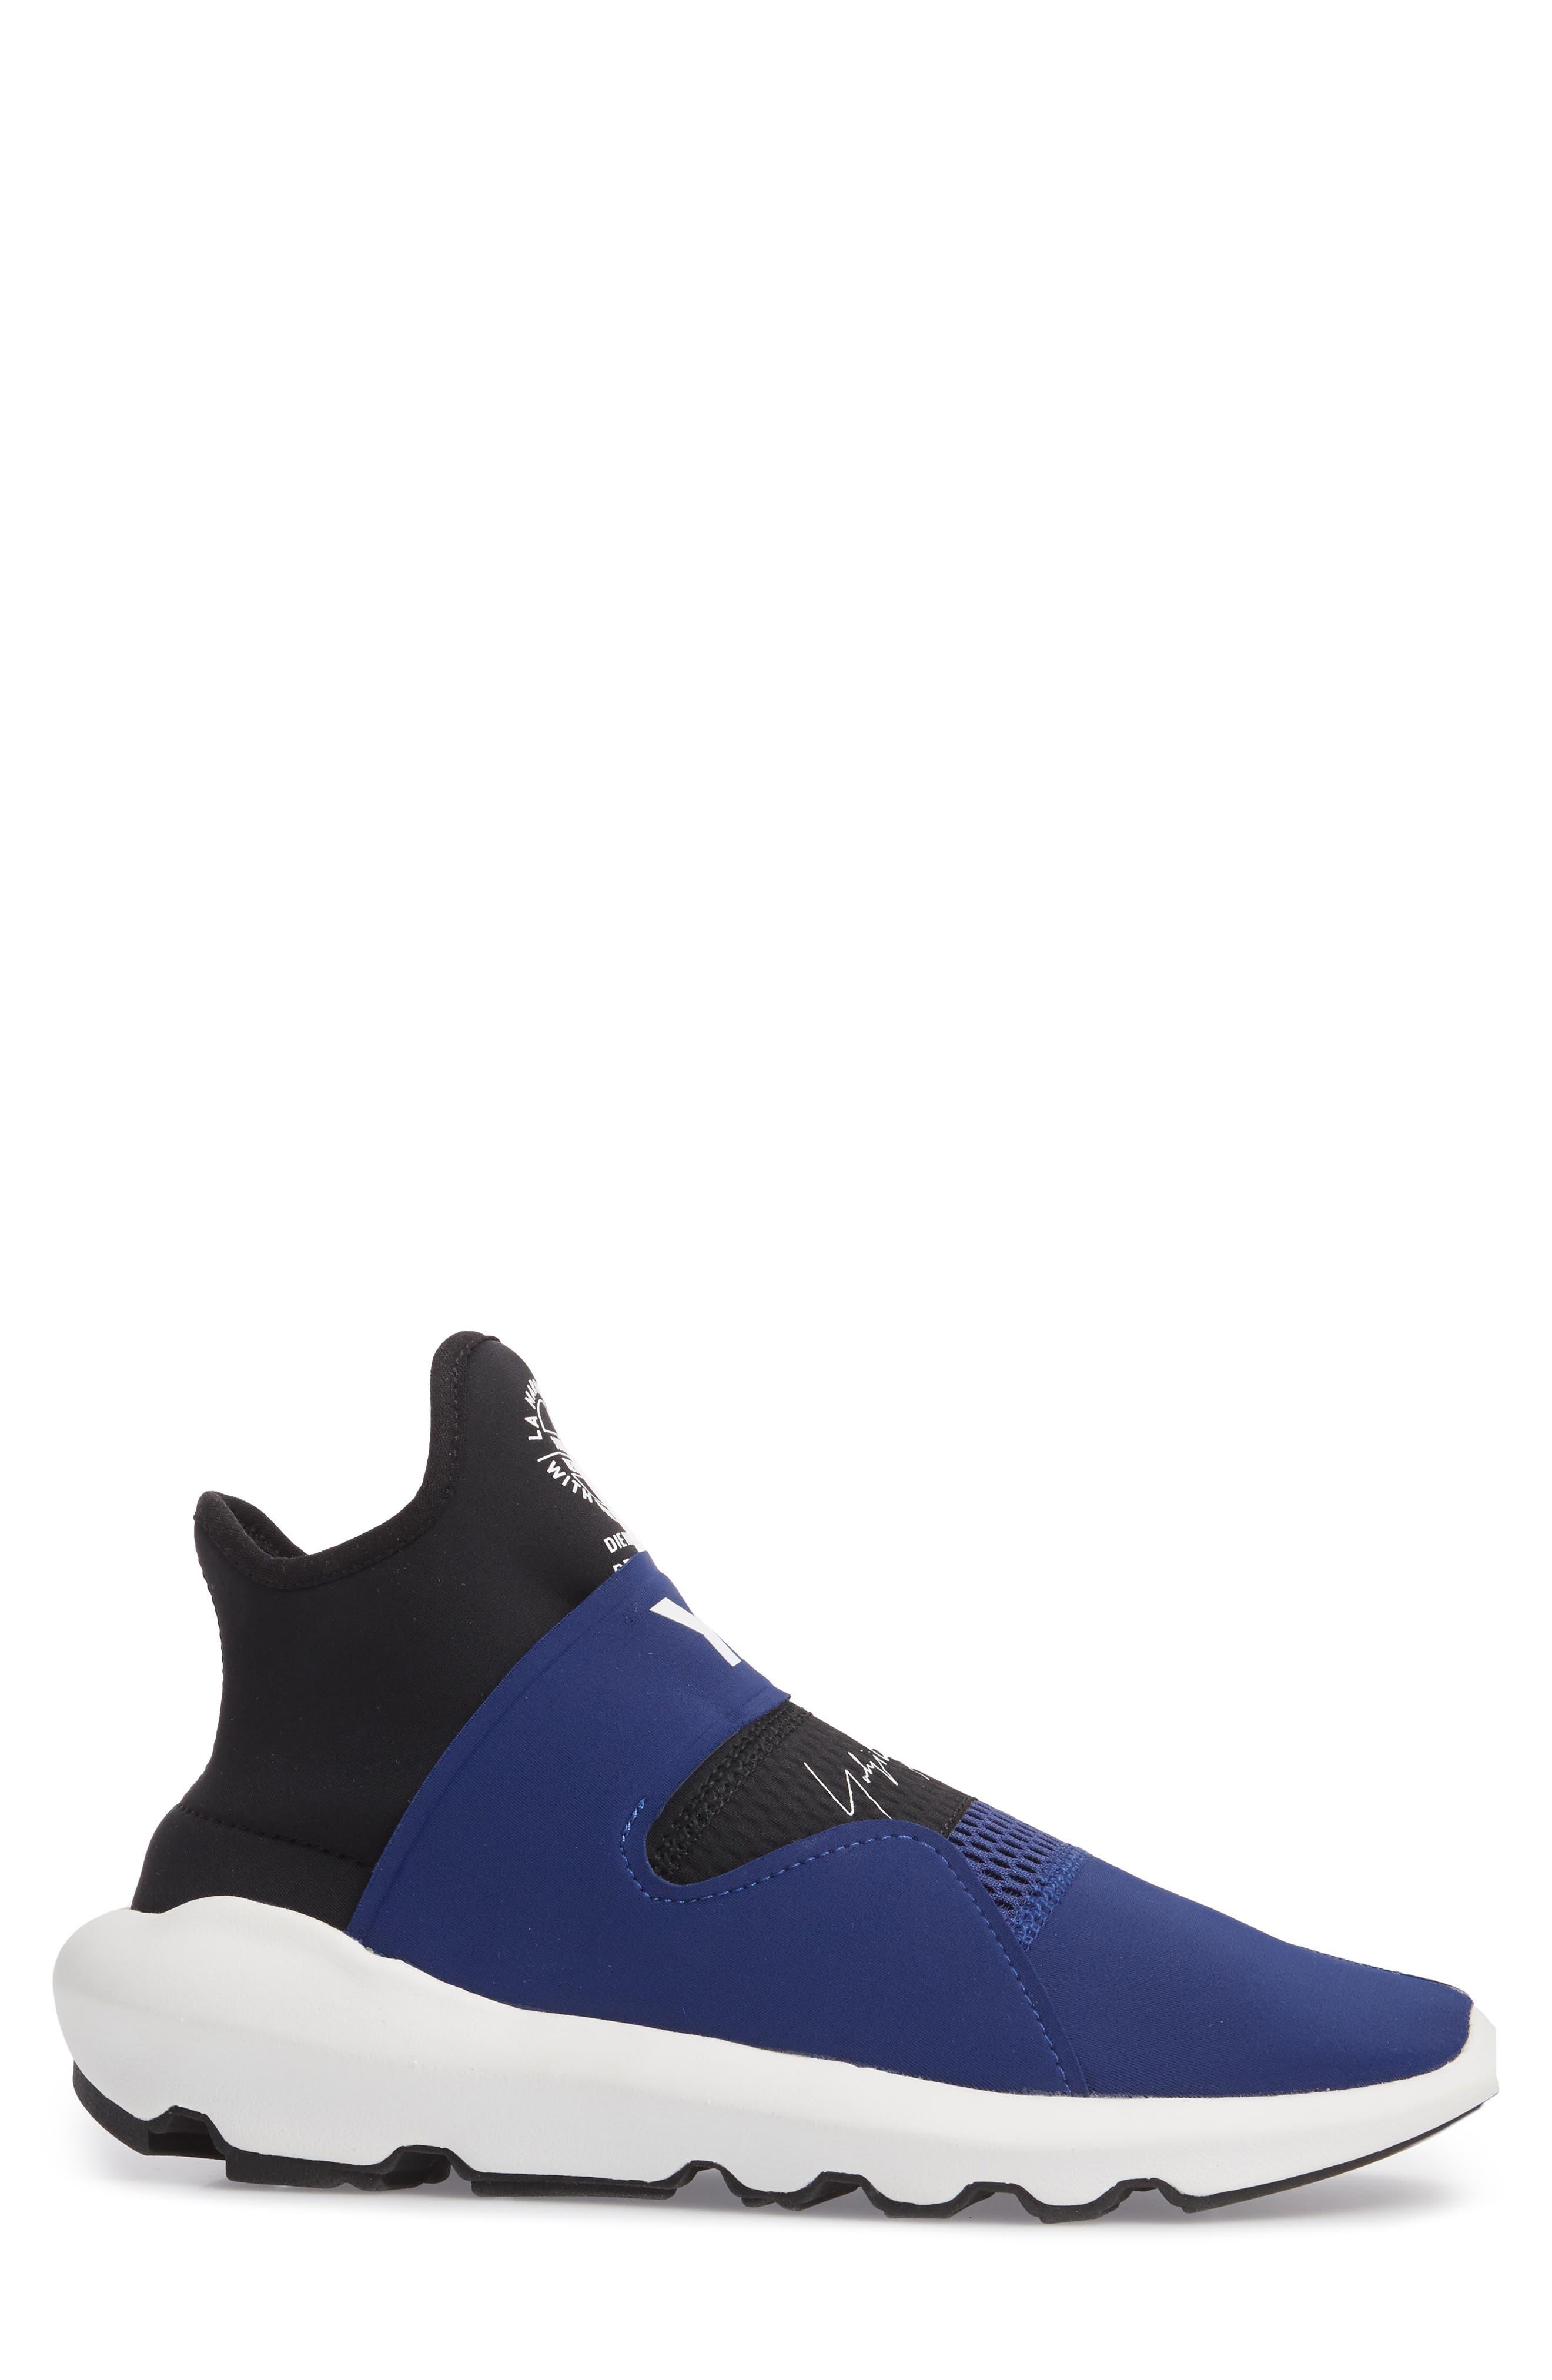 x adidas Suberou Sneaker,                             Alternate thumbnail 3, color,                             Unity Ink